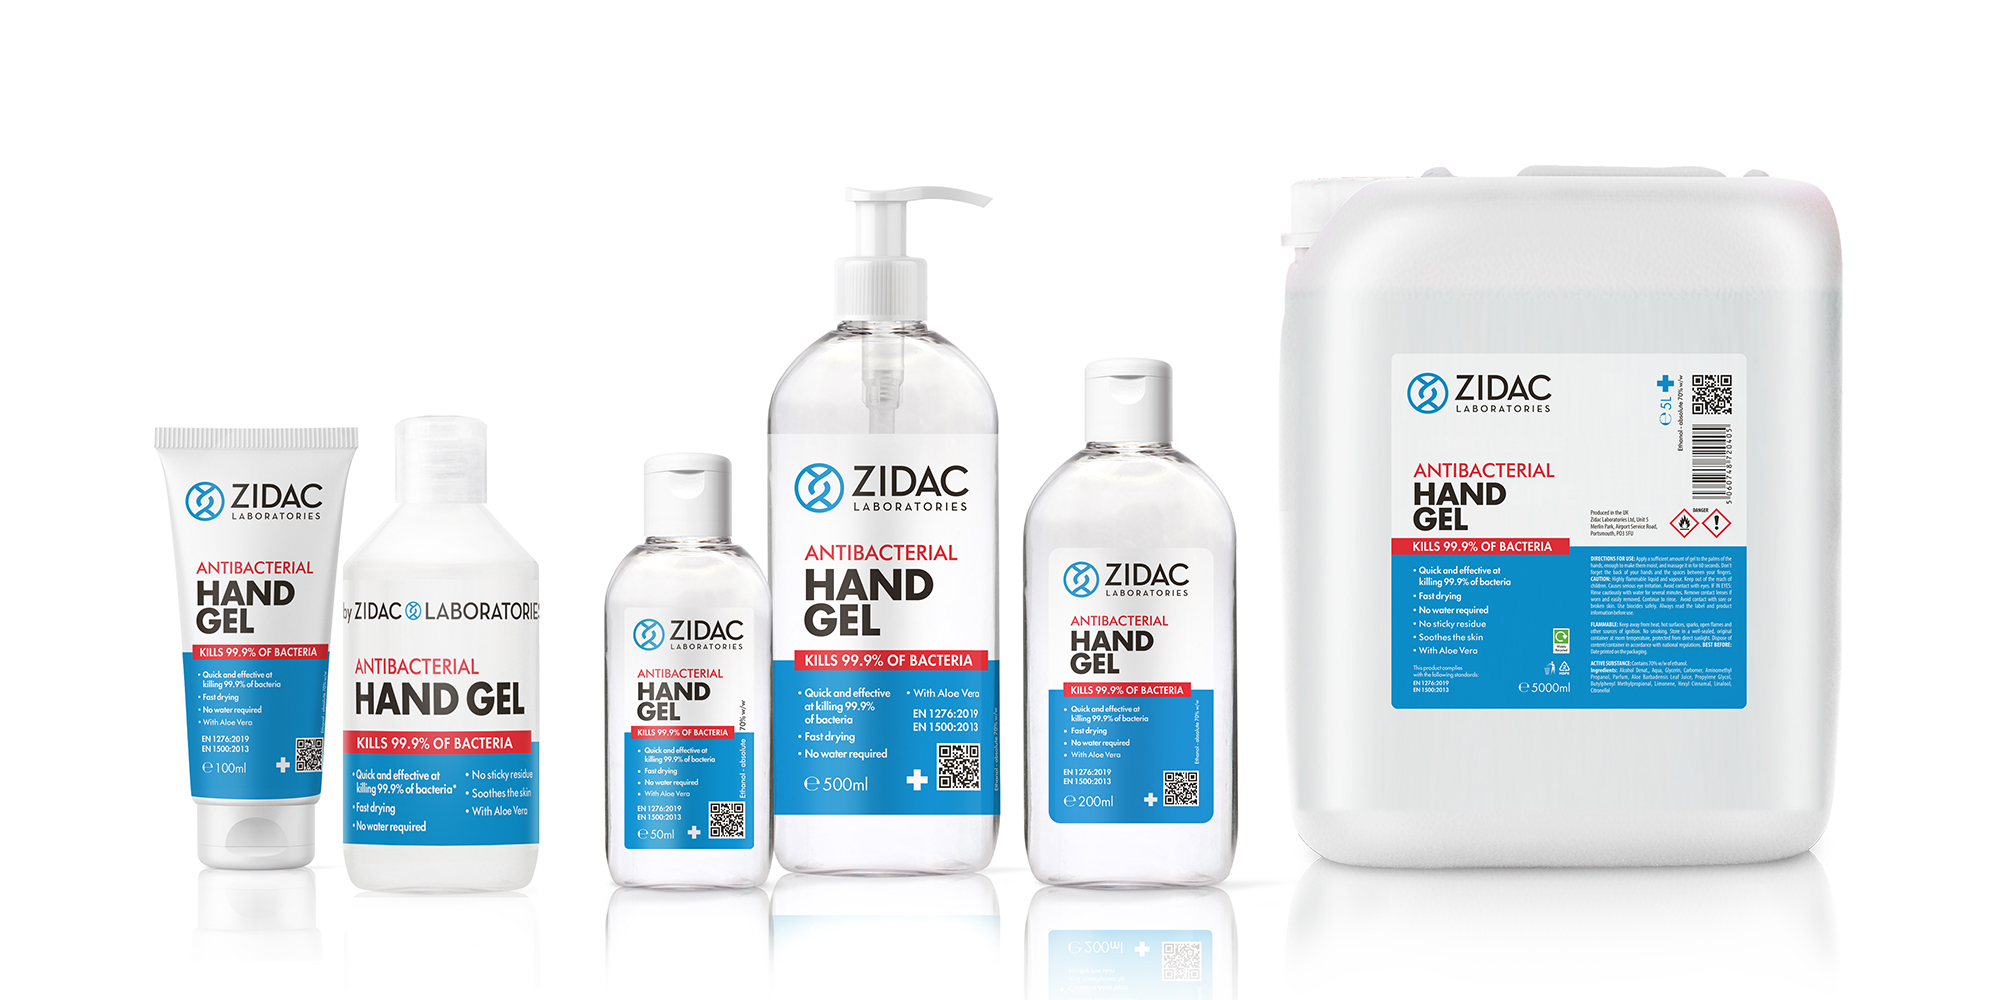 Zidac Hand Sanitisers